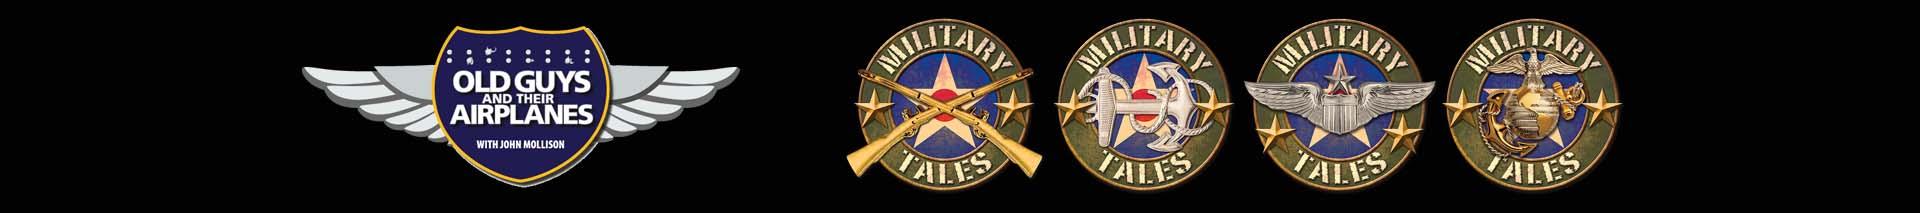 Military Videos